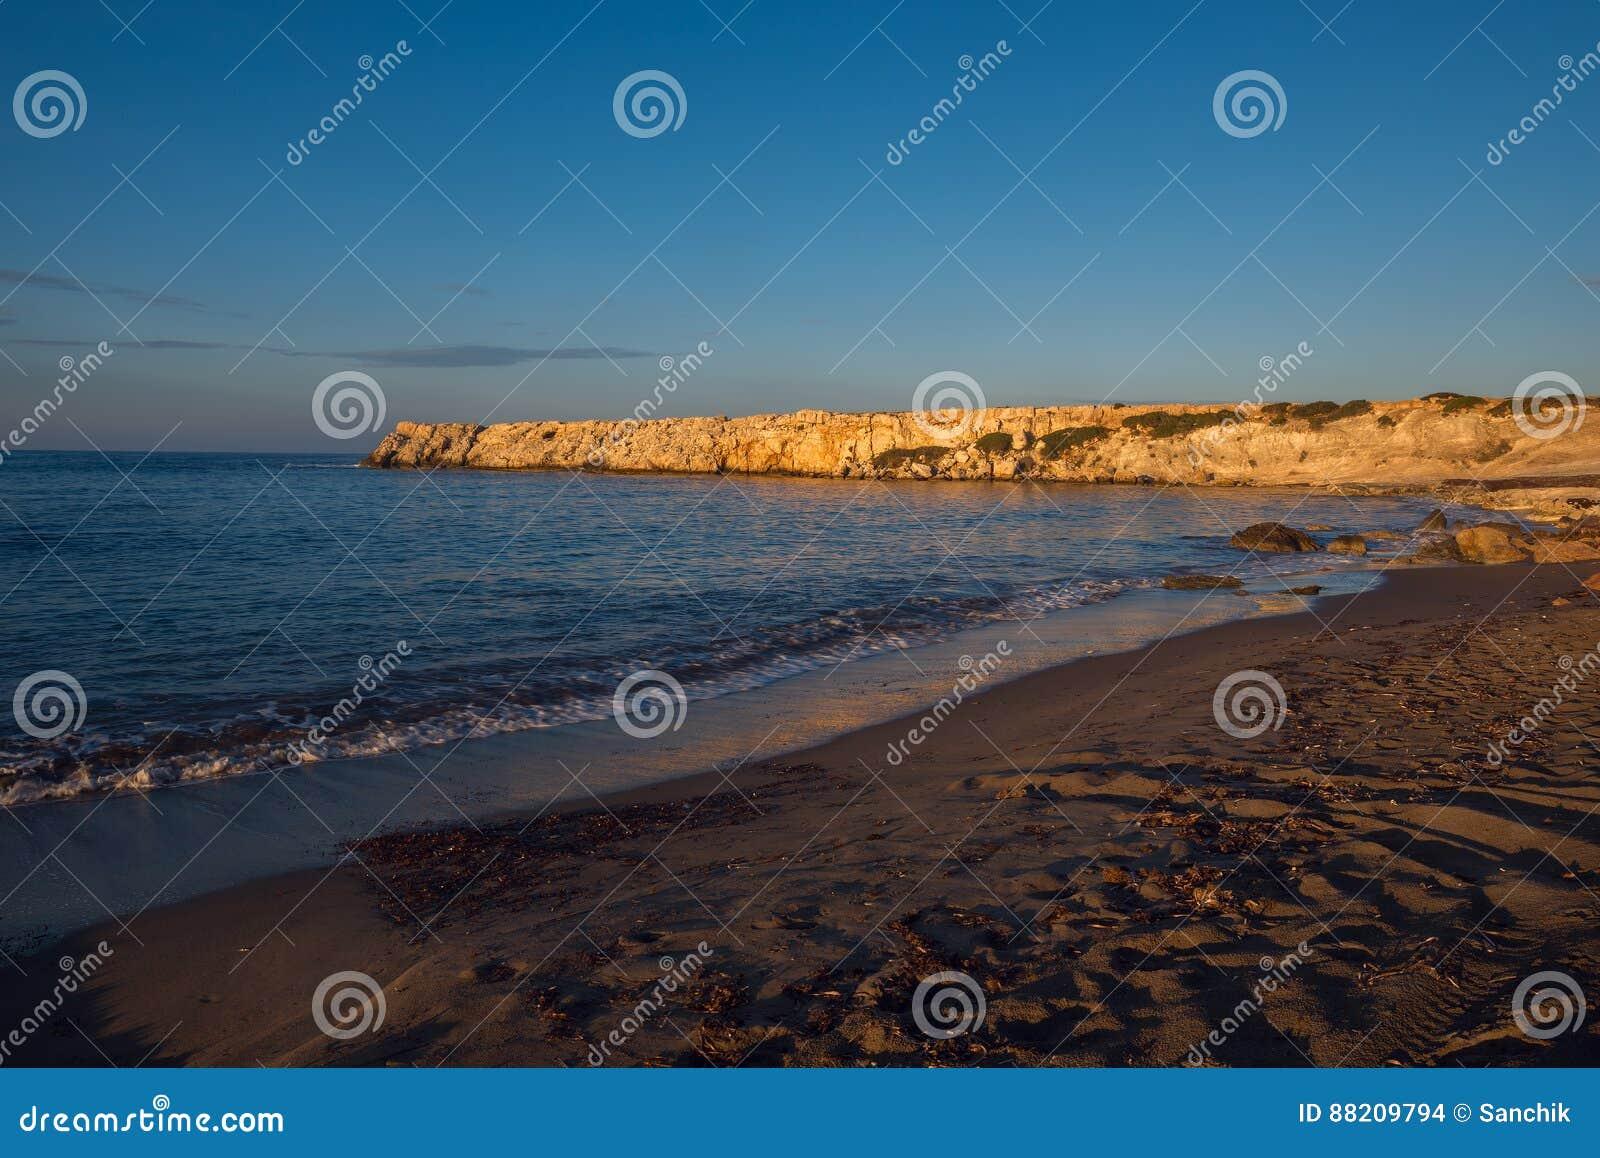 Tramonto alla costa del mar Mediterraneo